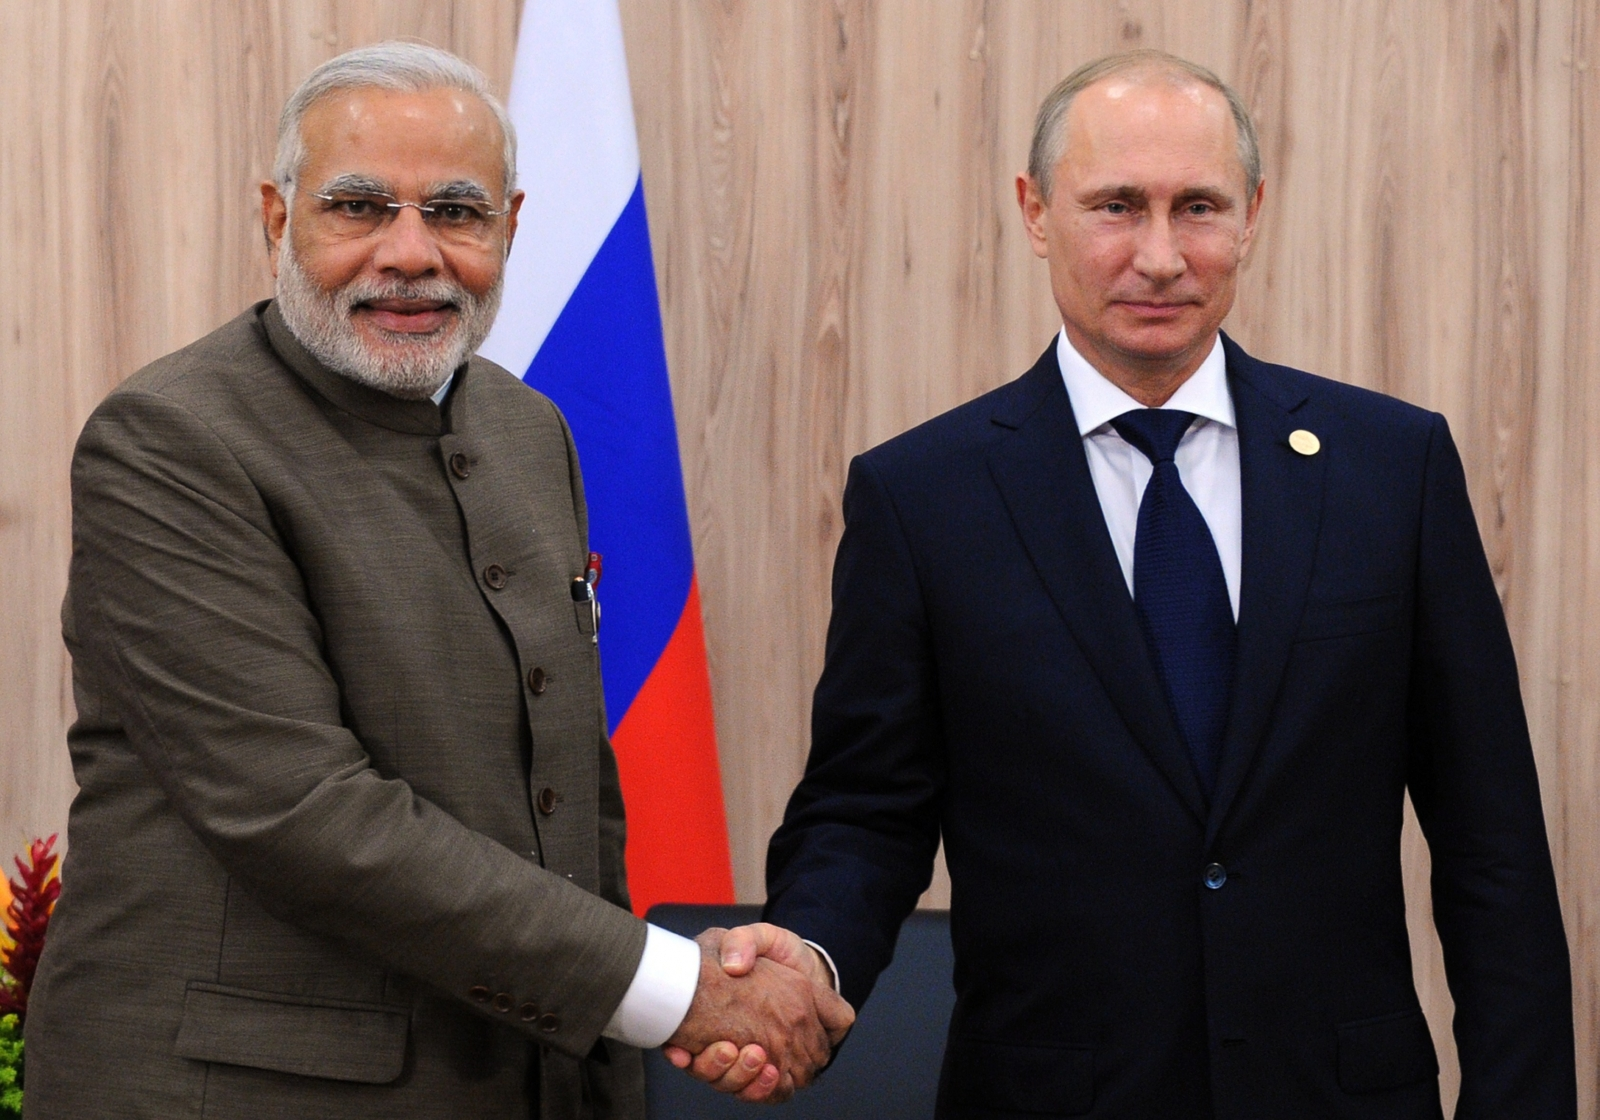 India-Russia bilateral summit as Vladimir Putin set to visit New Delhi